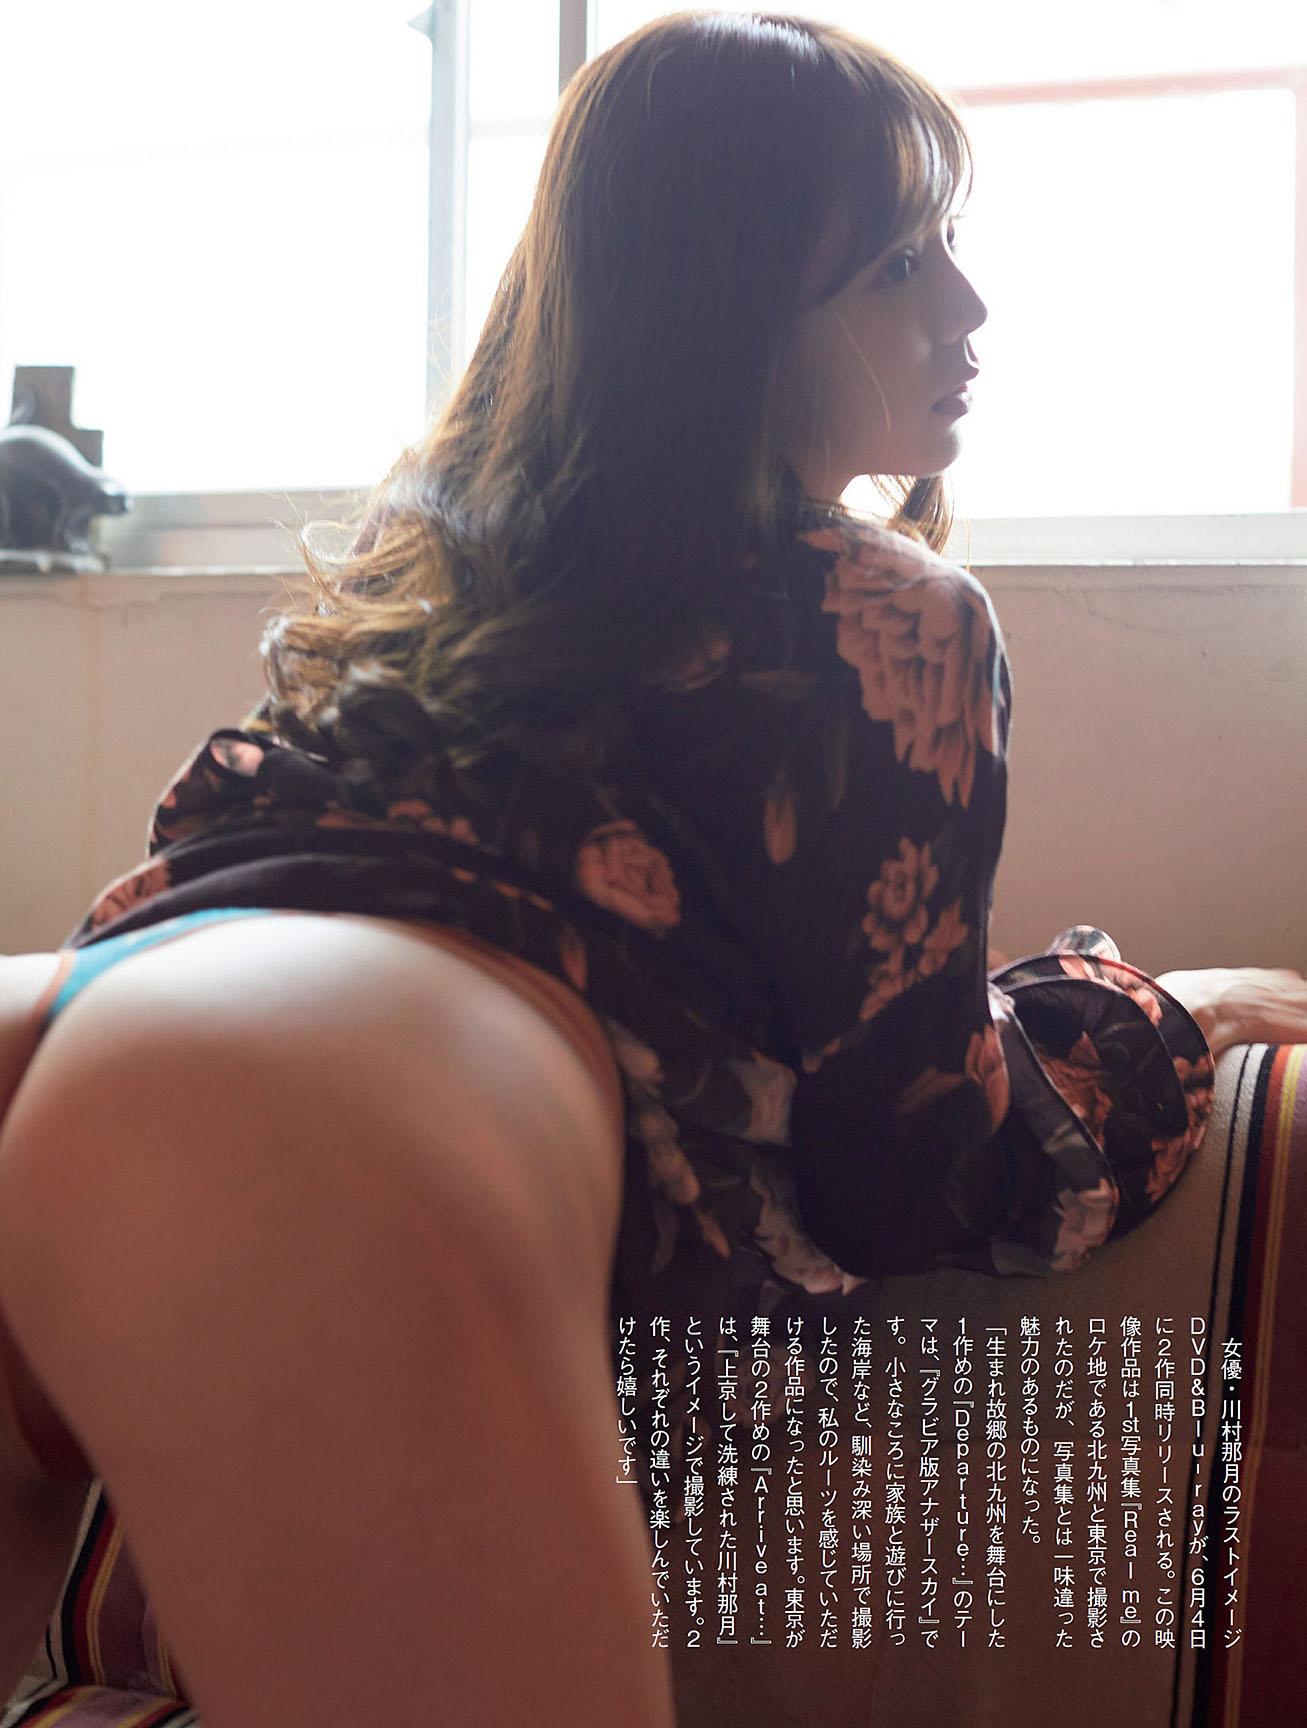 Natsuki Kawamura Flash 210608 02.jpg